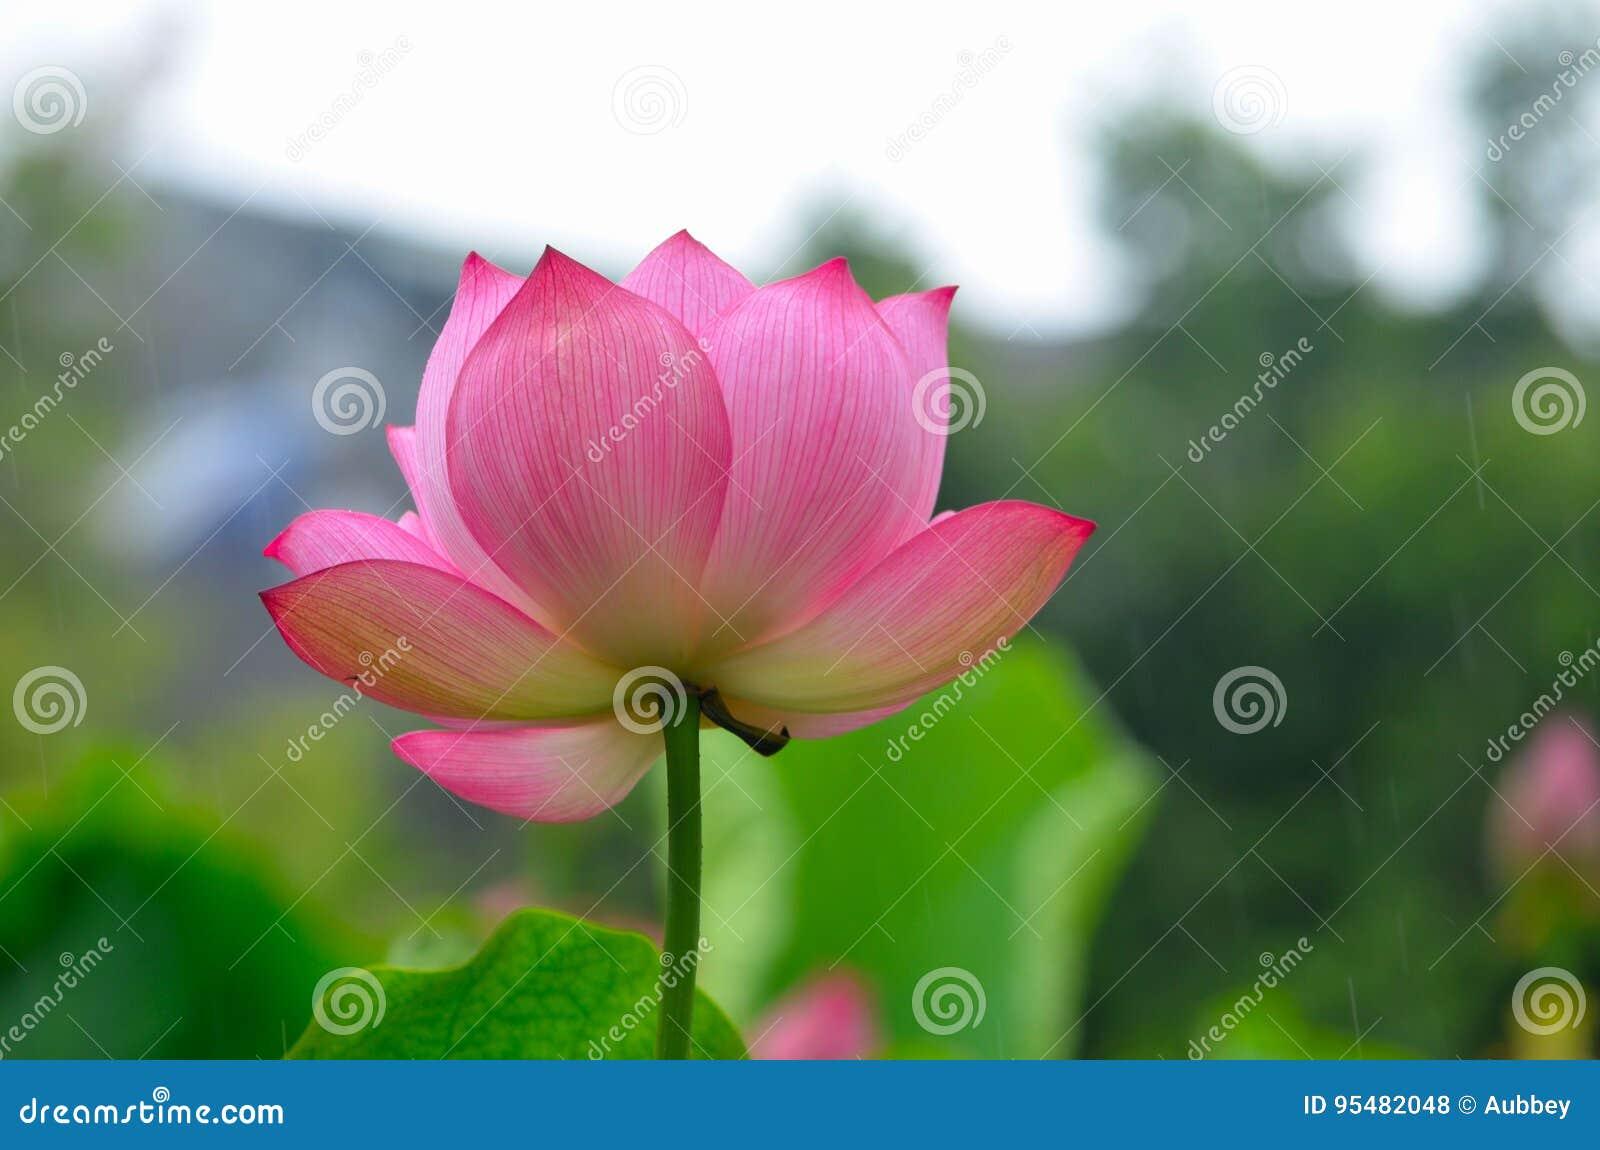 Holy lotus flower stock photo image of environment color 95482048 holy lotus flower izmirmasajfo Image collections